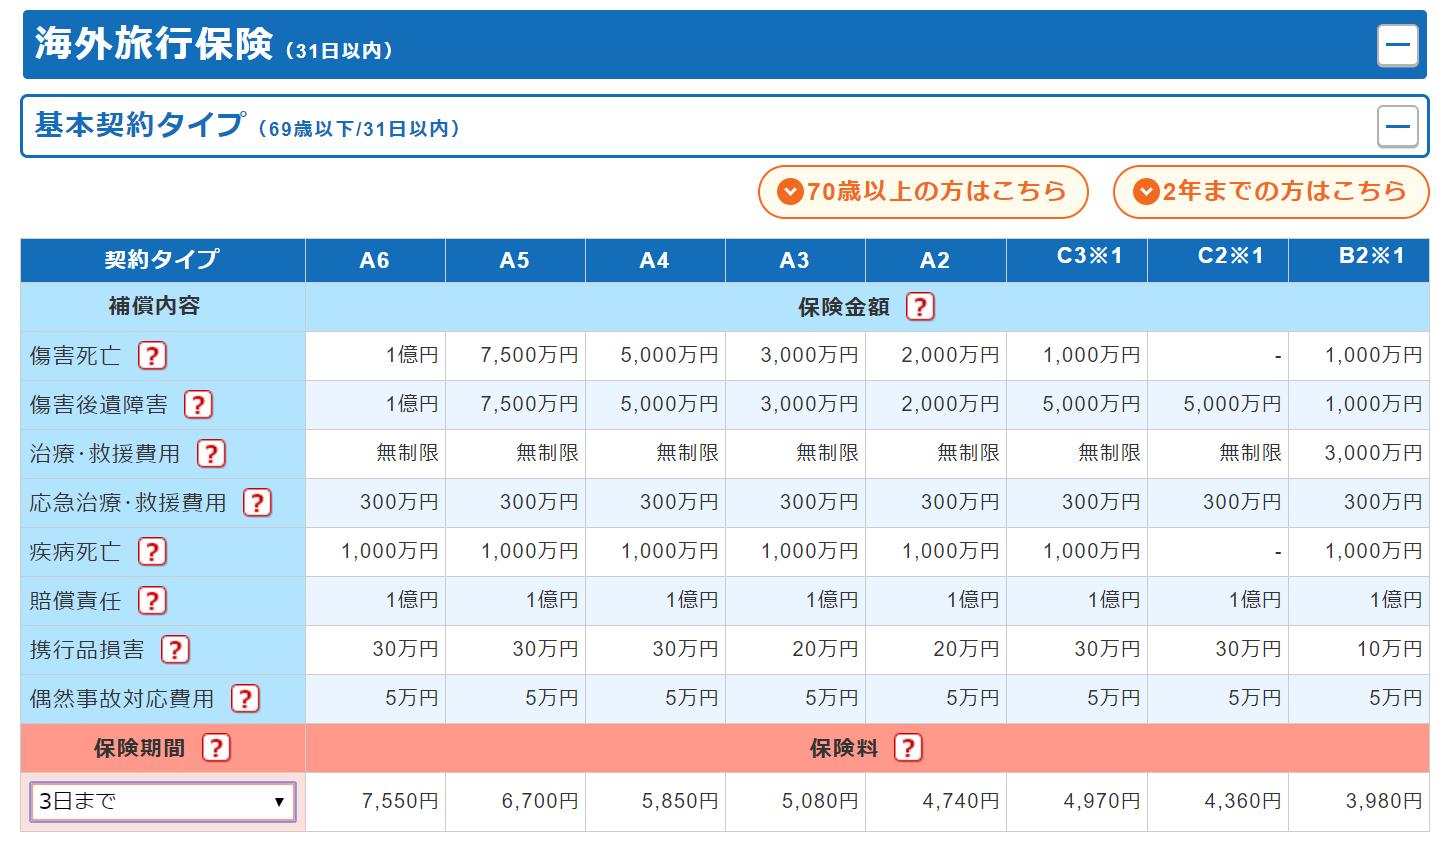 東京海上日動の海外旅行保険の費用